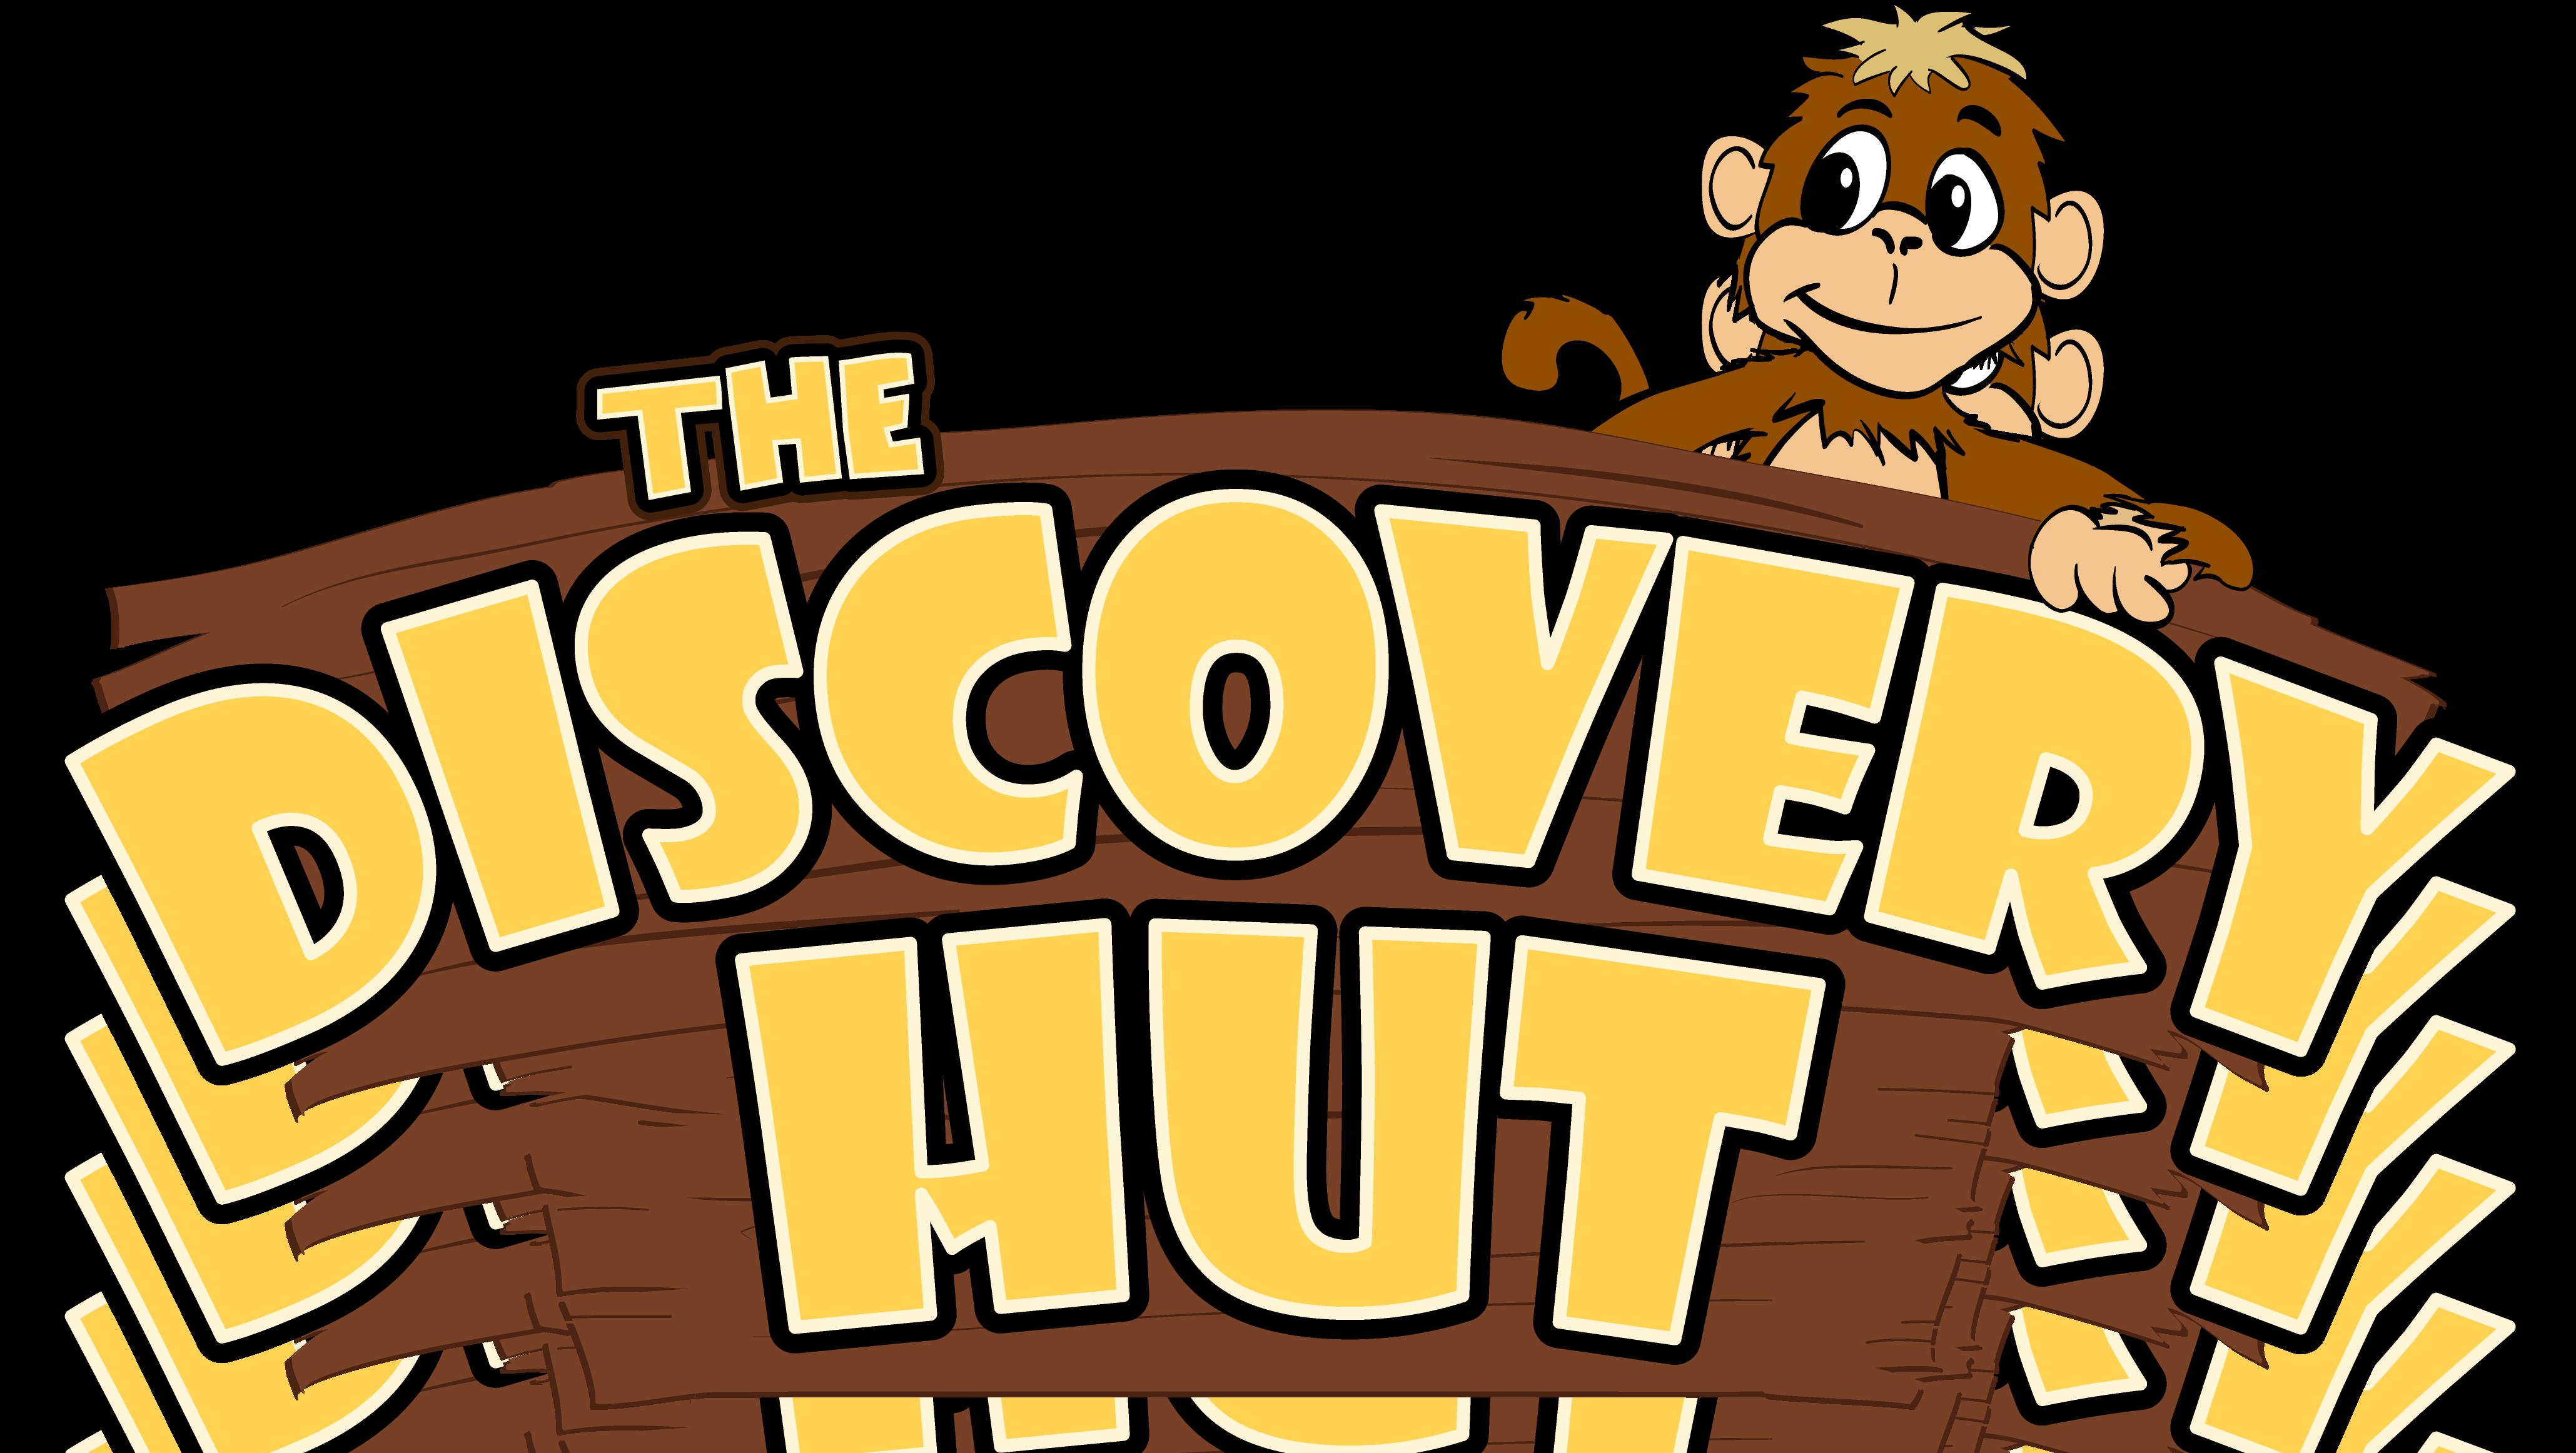 Hut clipart hutt. The discovery main